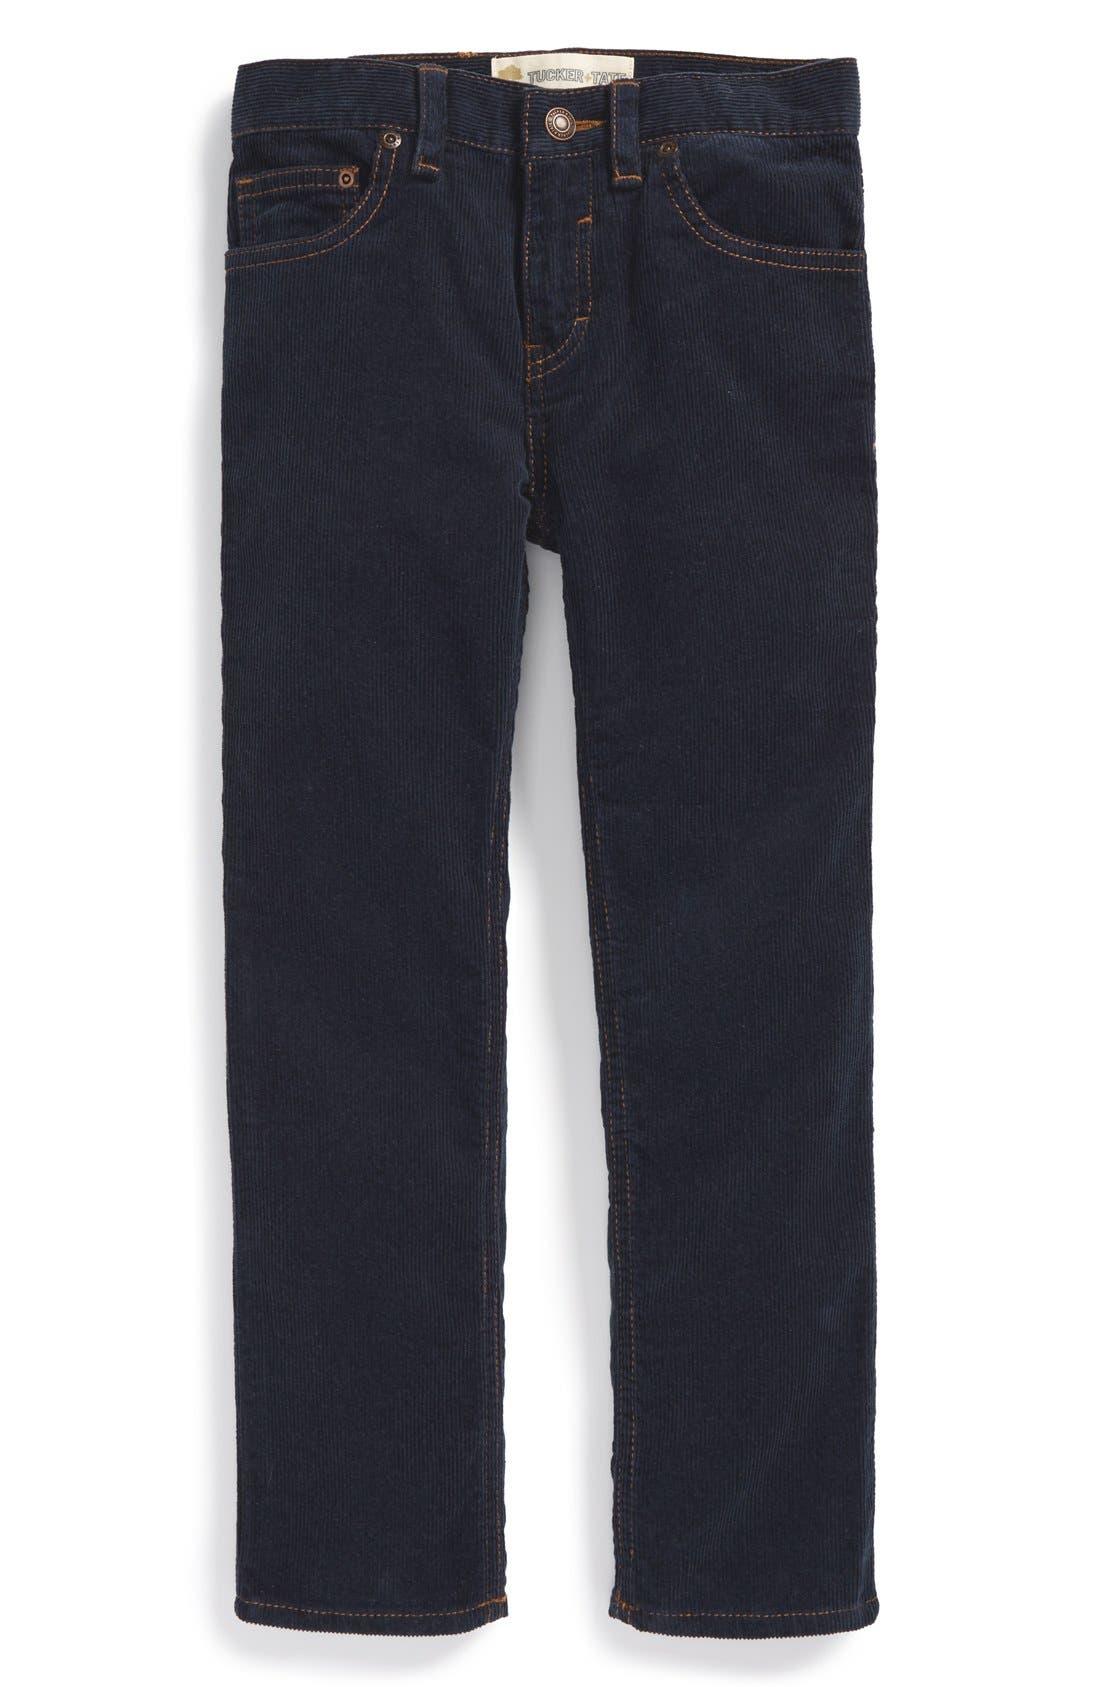 'Townsend' Corduroy Pants,                             Main thumbnail 7, color,